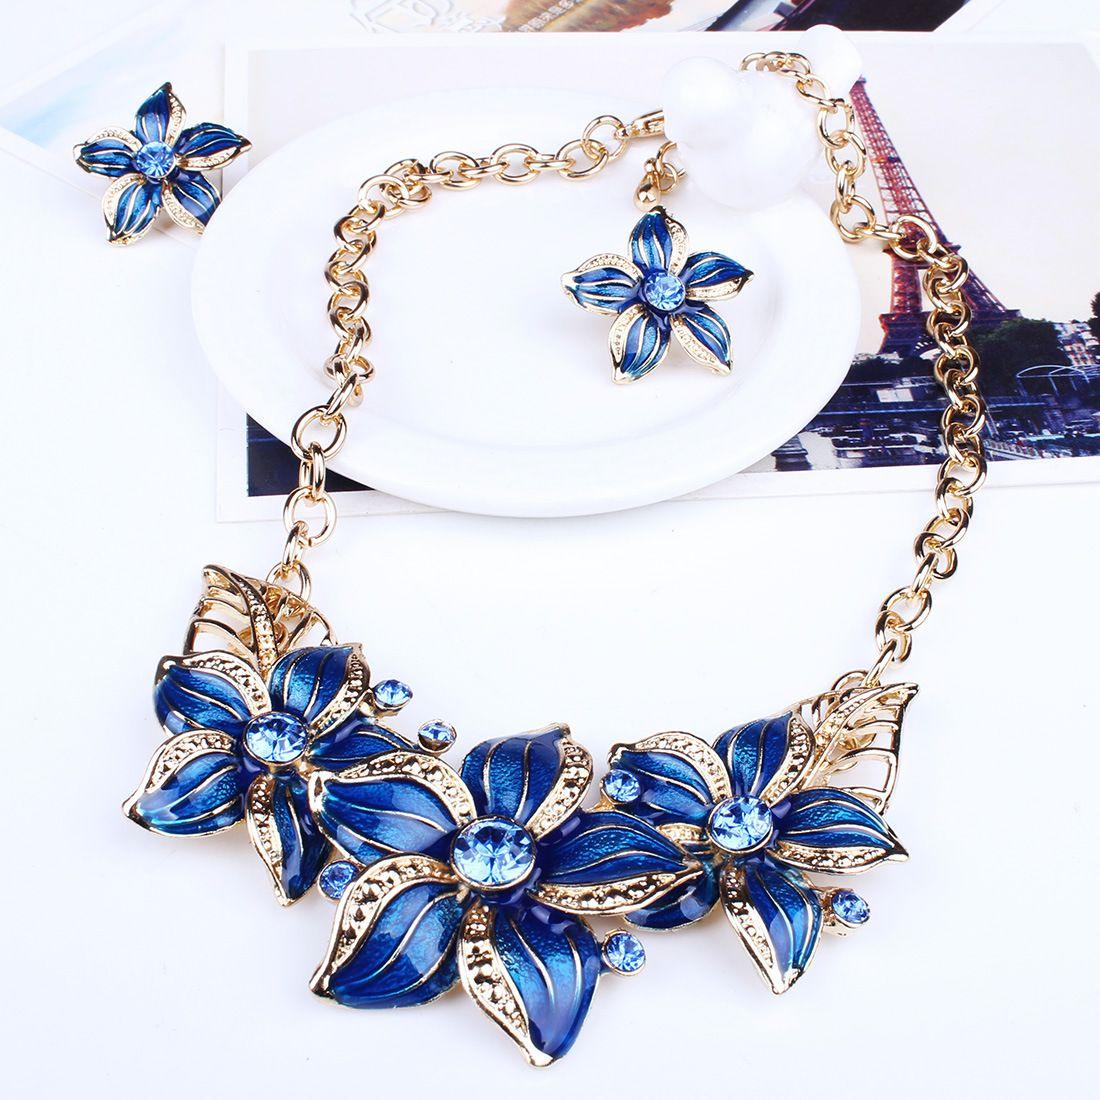 Imitation Pearl Jewelry Sets Maxi Necklaces & Pendants Stud Earrings Set for Women Gold/Silver Statement Parure Bijoux Femme